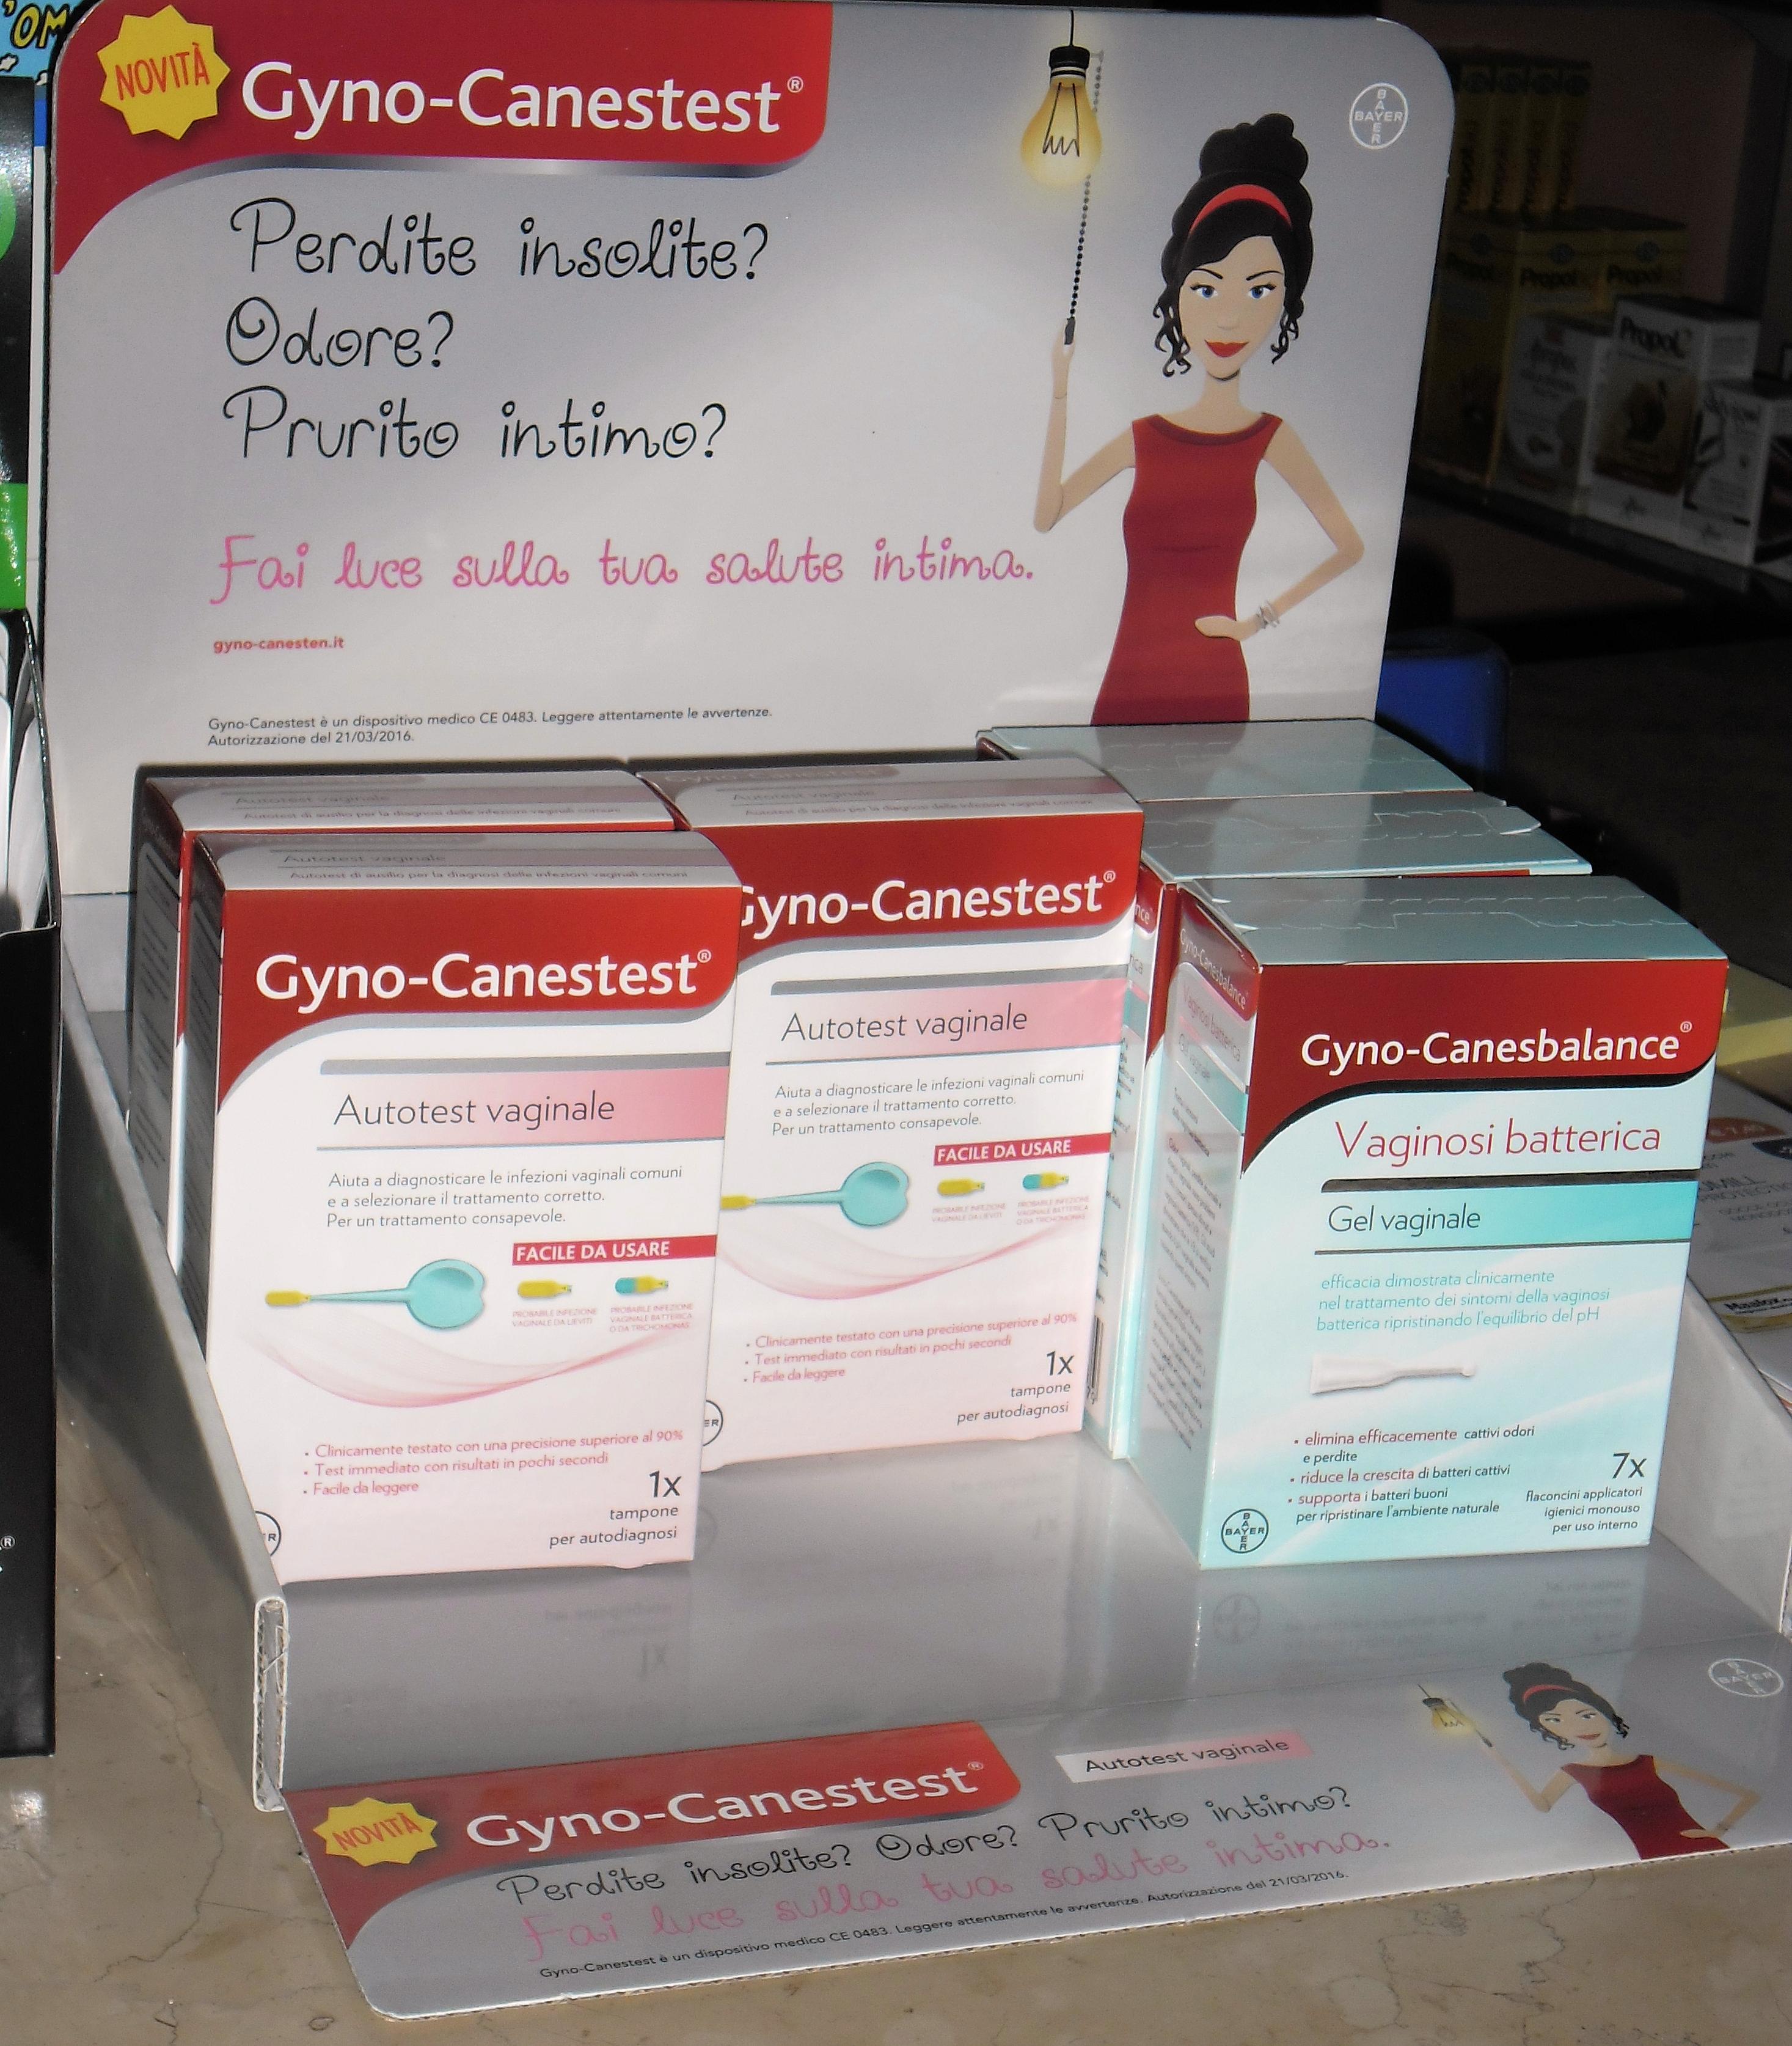 expo gynocanestest